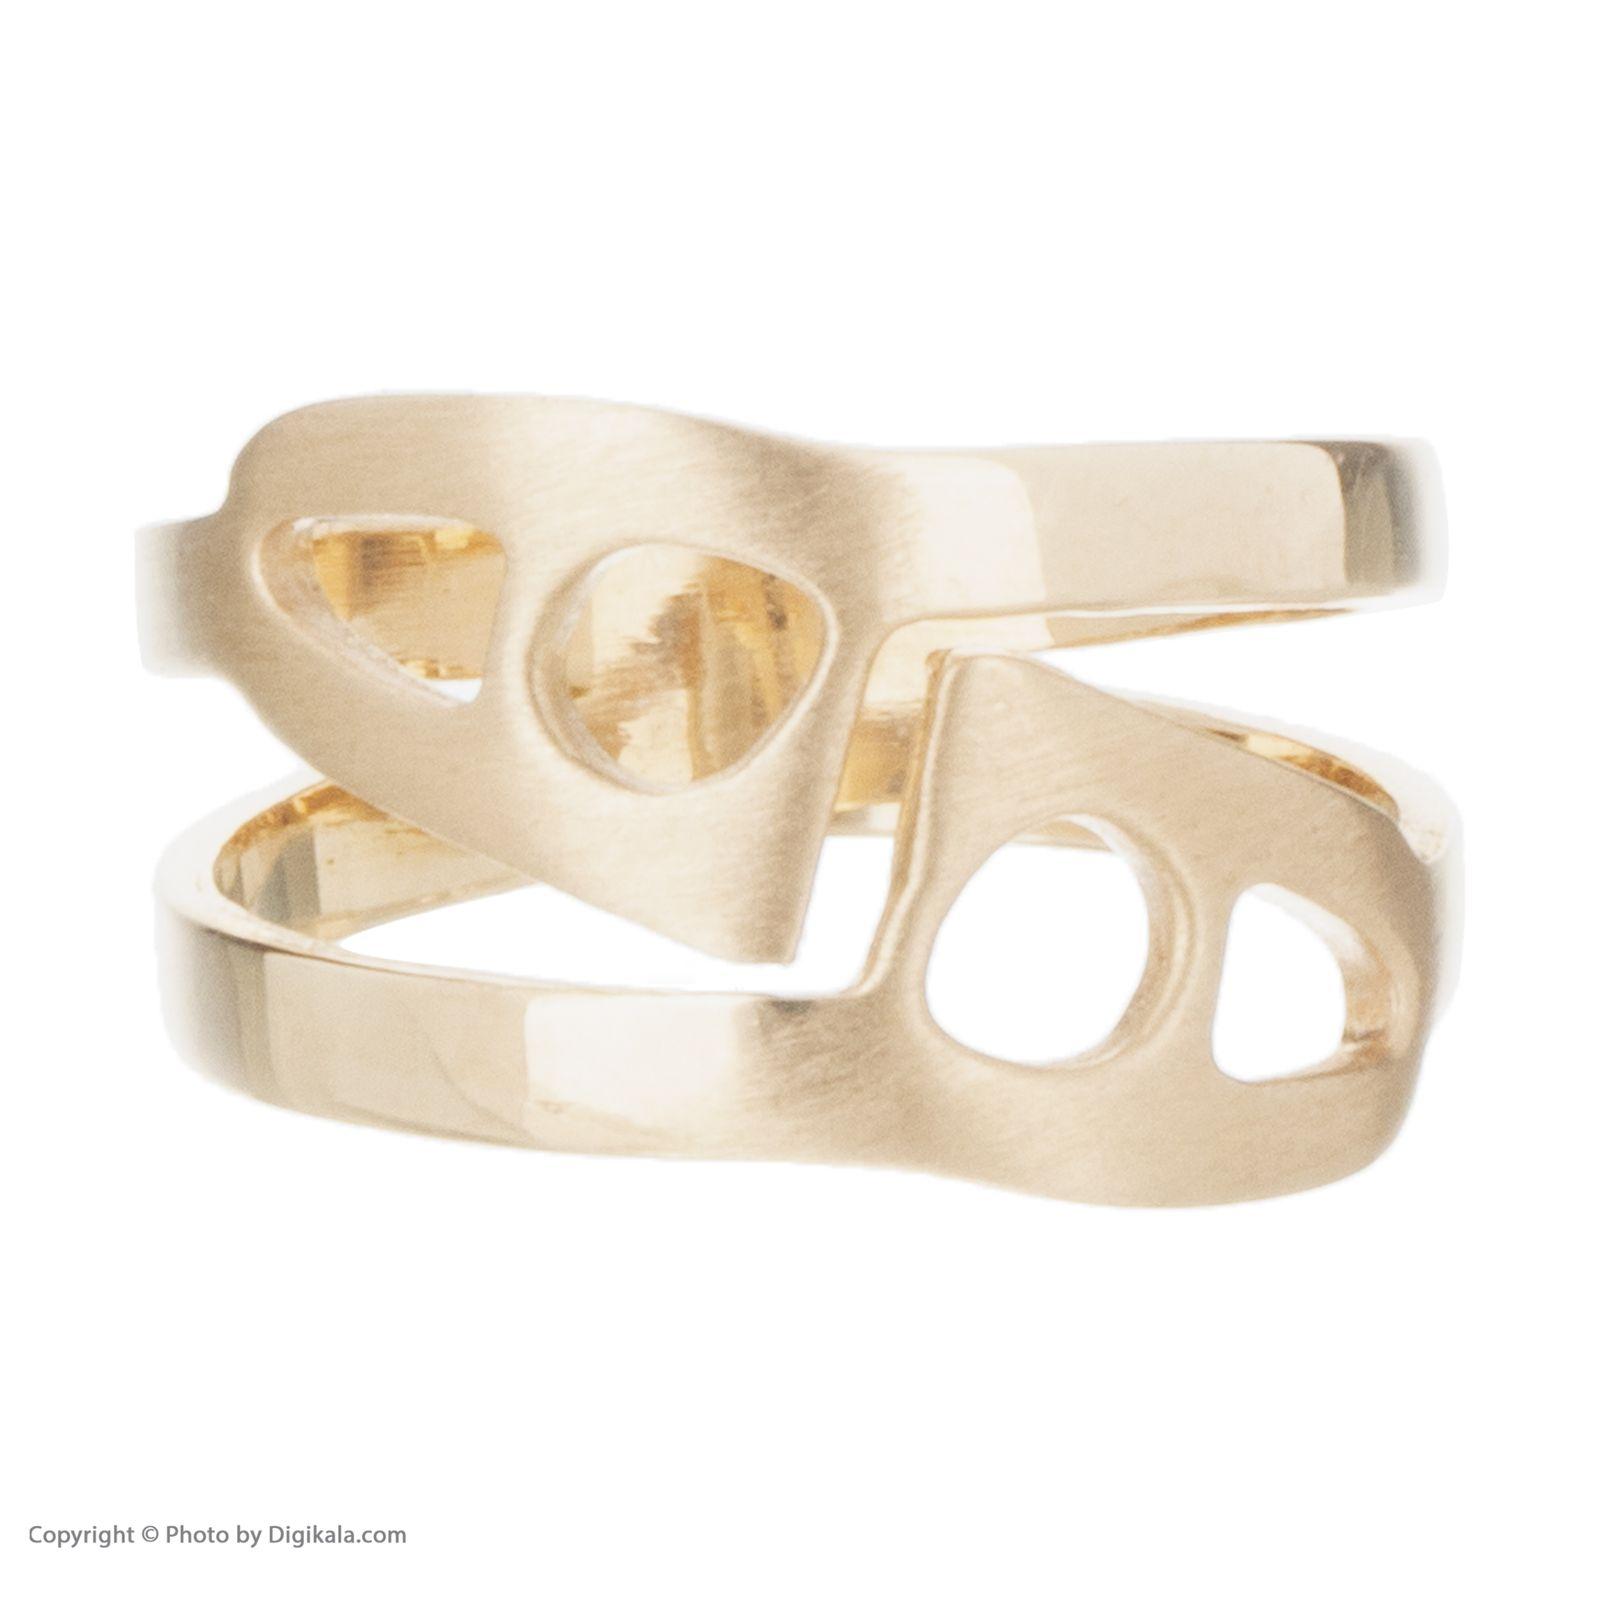 انگشتر طلا 18 عیار زنانه آلند کد H1022 -  - 1